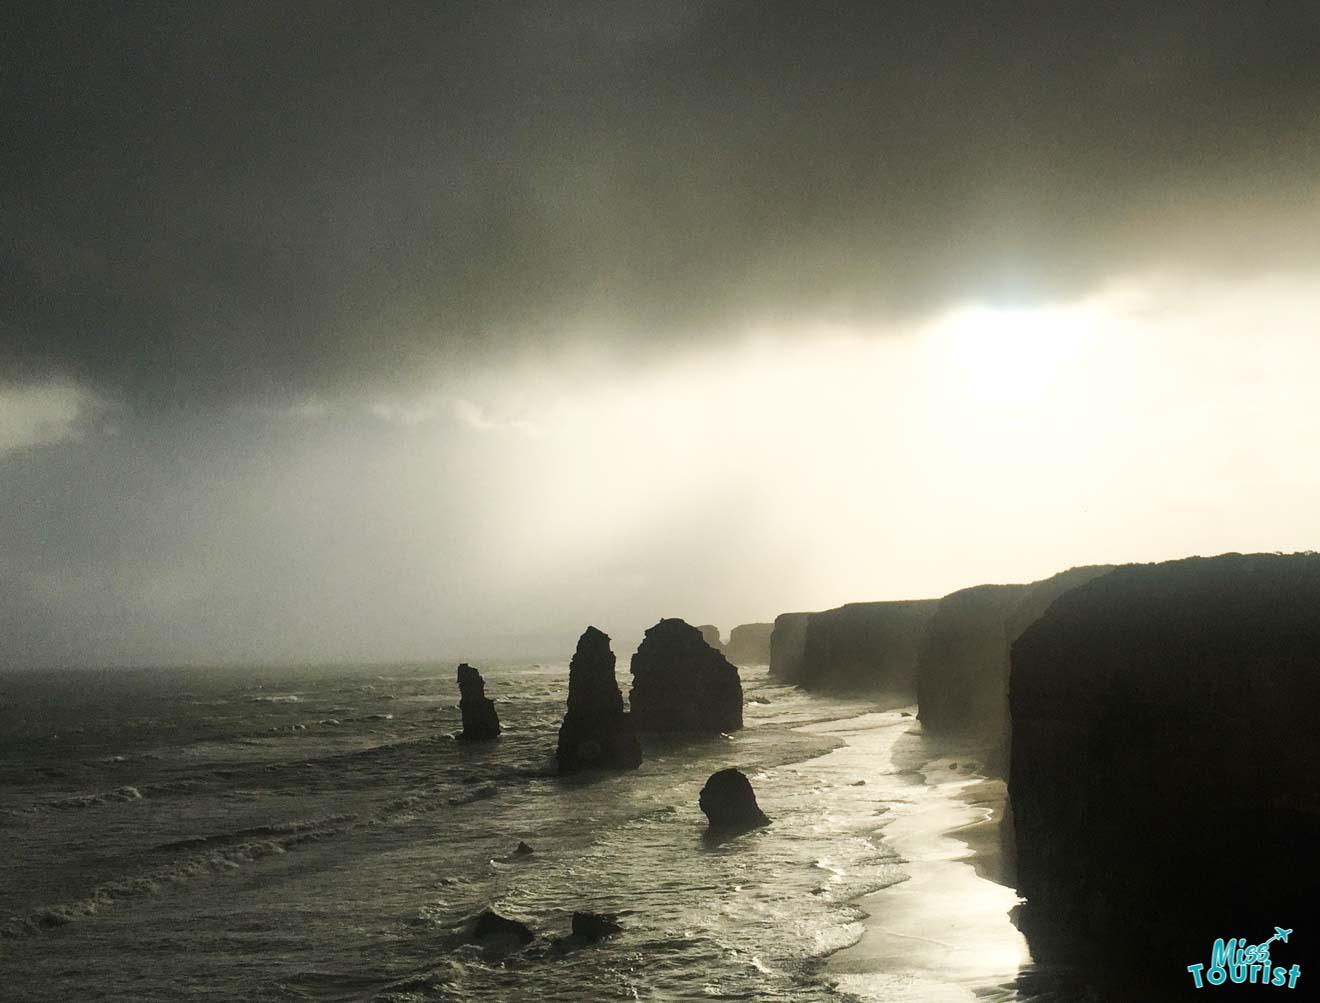 Must-stop places - Great ocean road trip